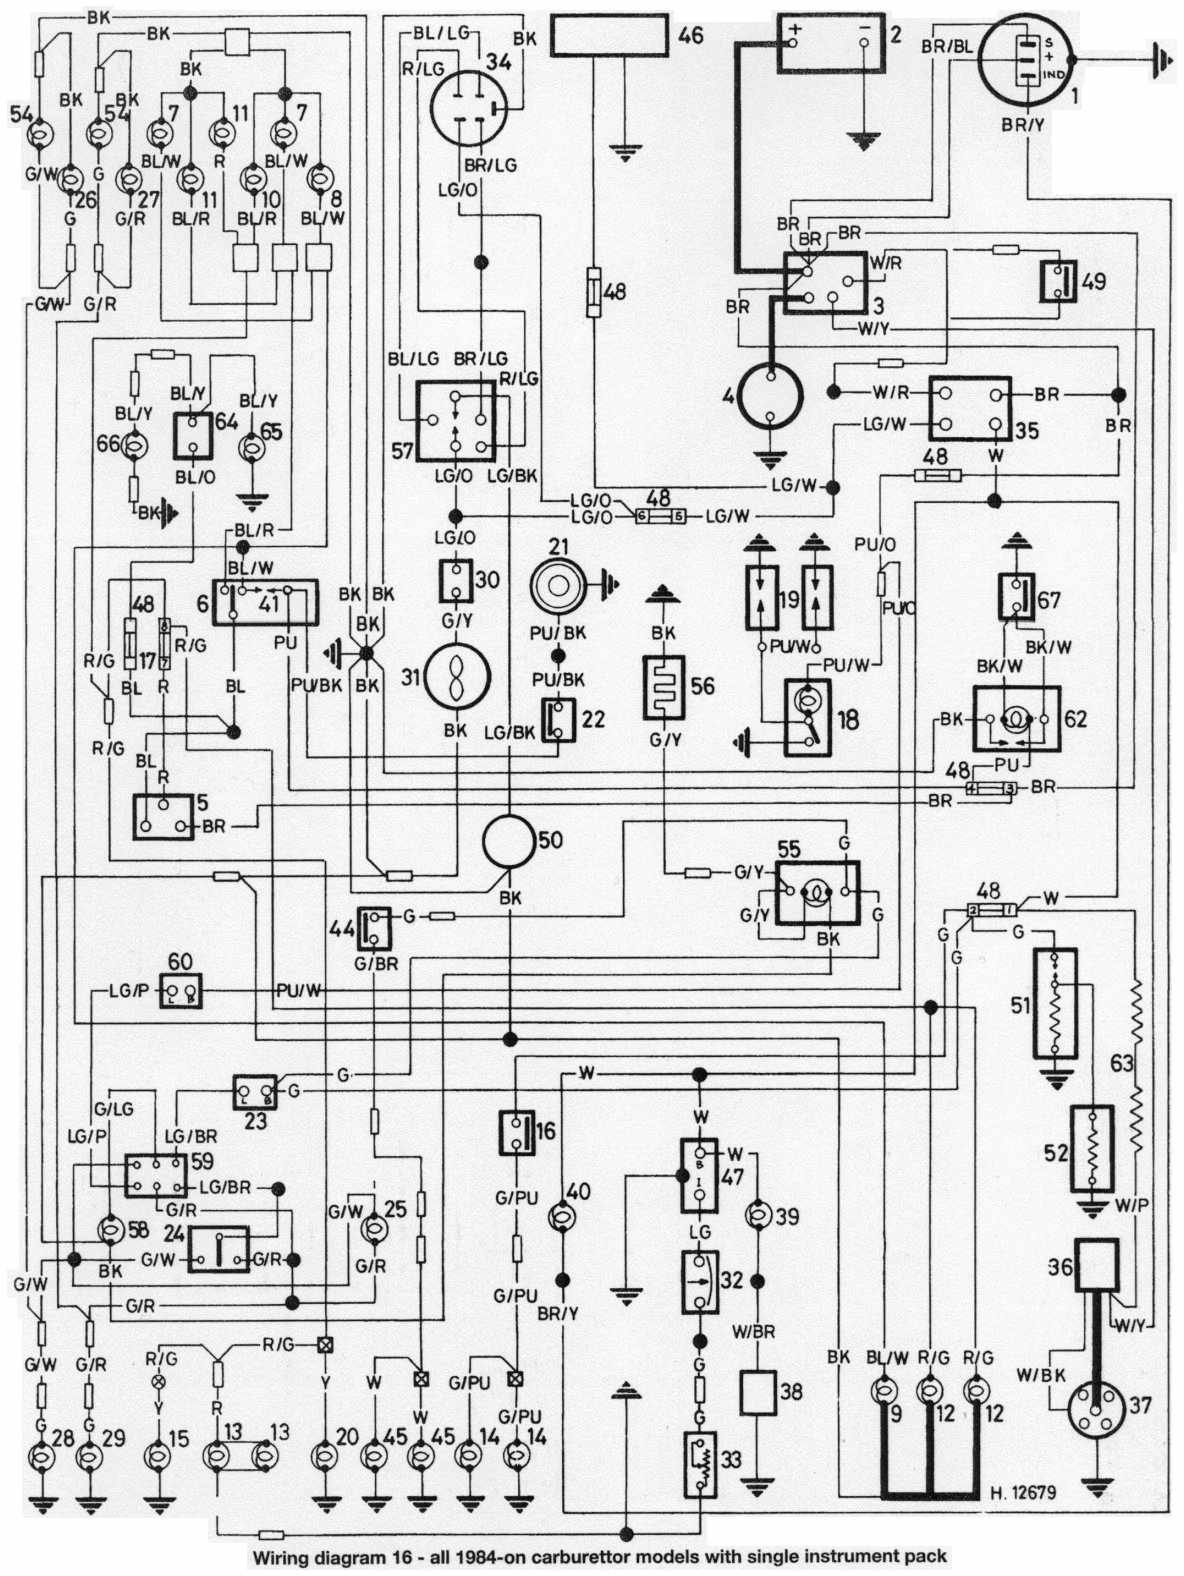 austin mini wiring diagram picture of flowchart, Wiring diagram